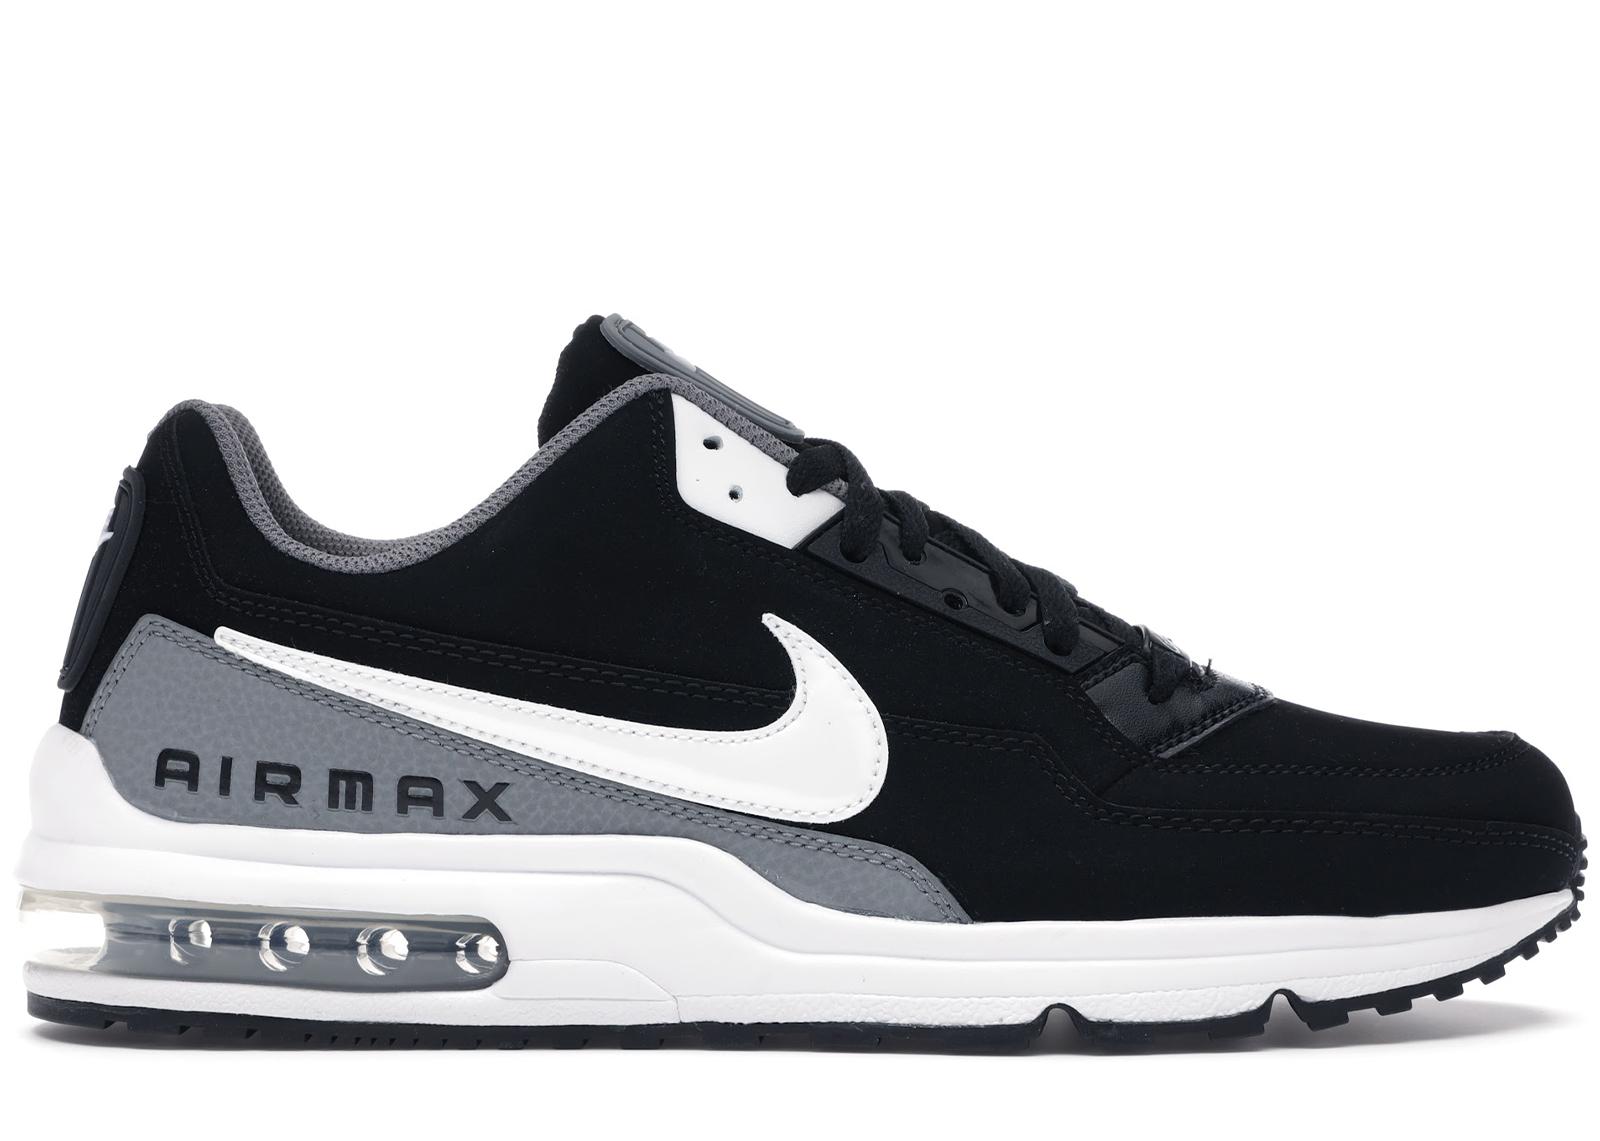 Nike Air Max LTD 3 Black Cool Grey White - BV1171-001